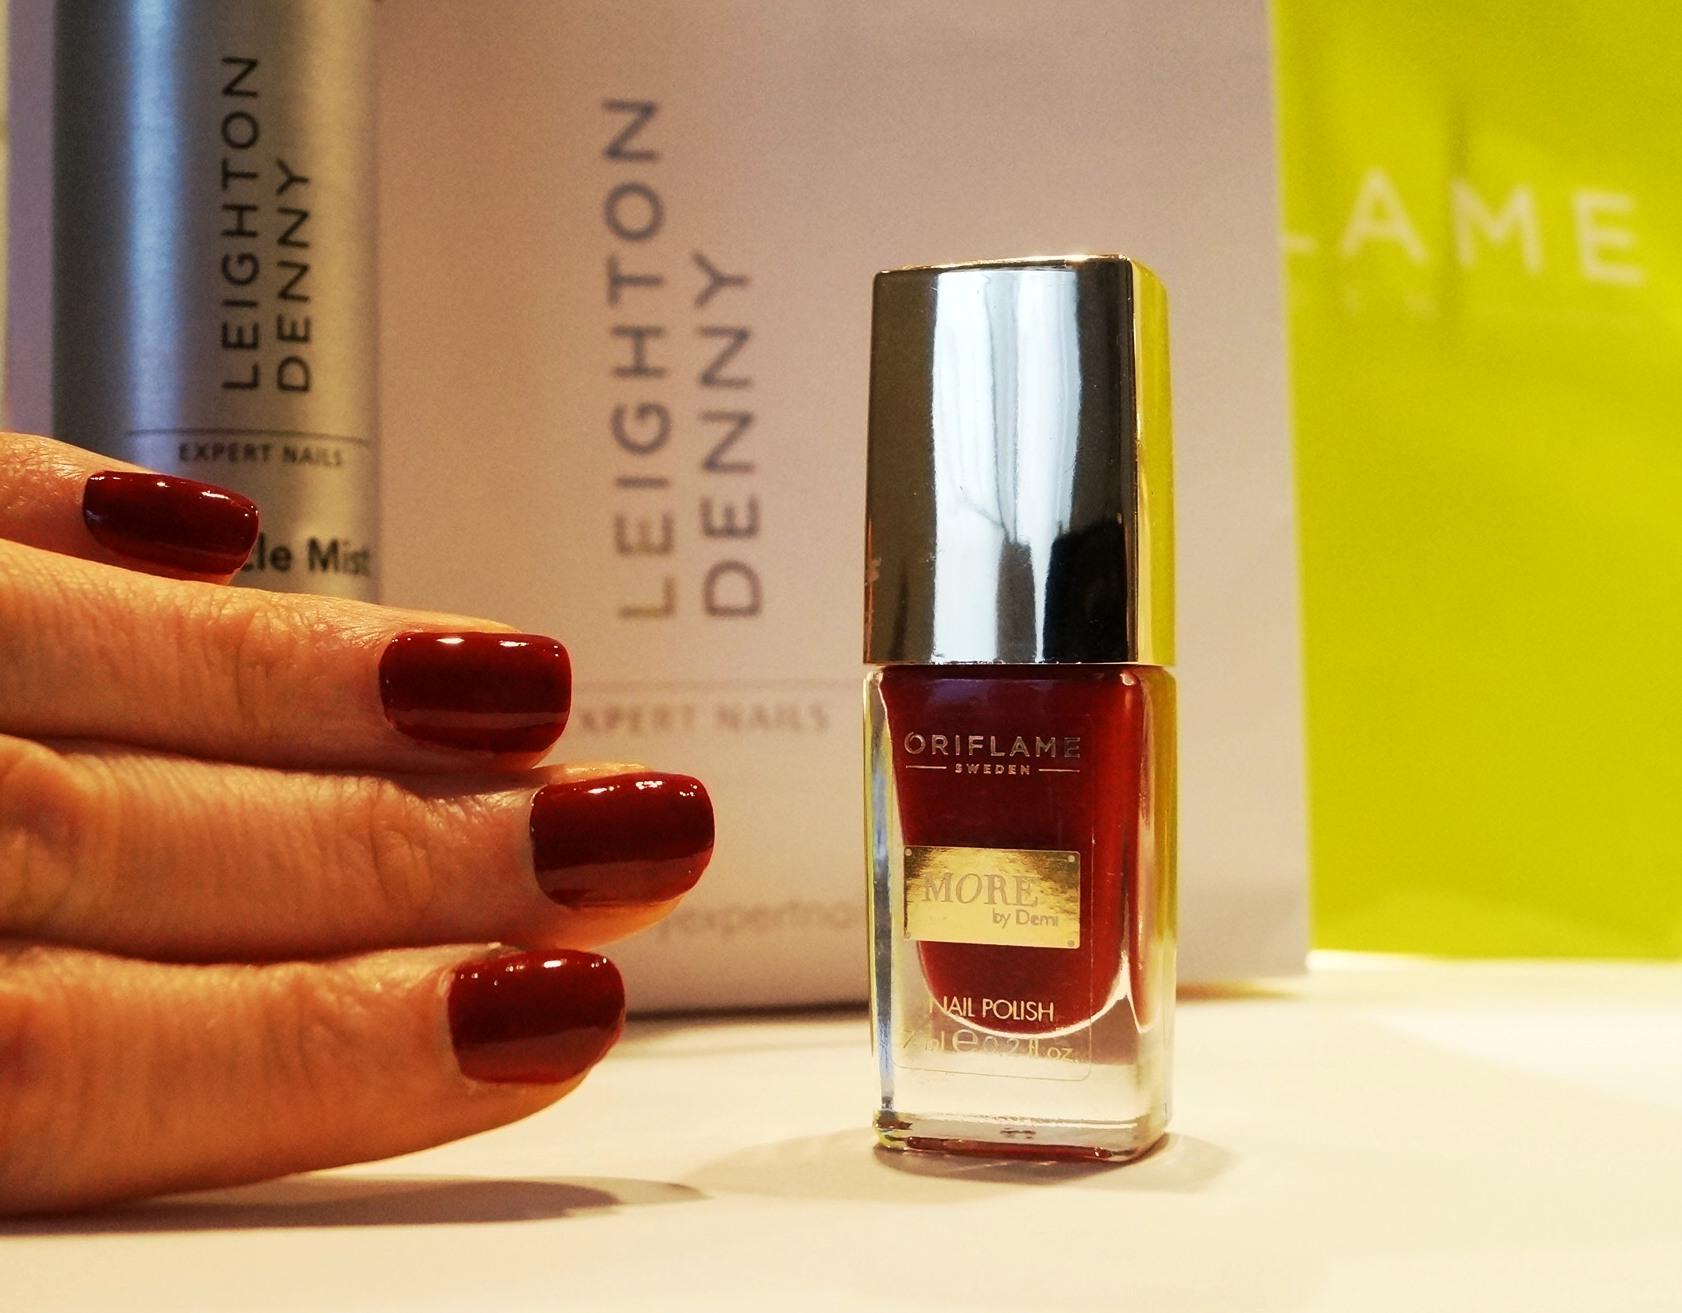 More by Demi Oriflame nagellack är riktigt bra.